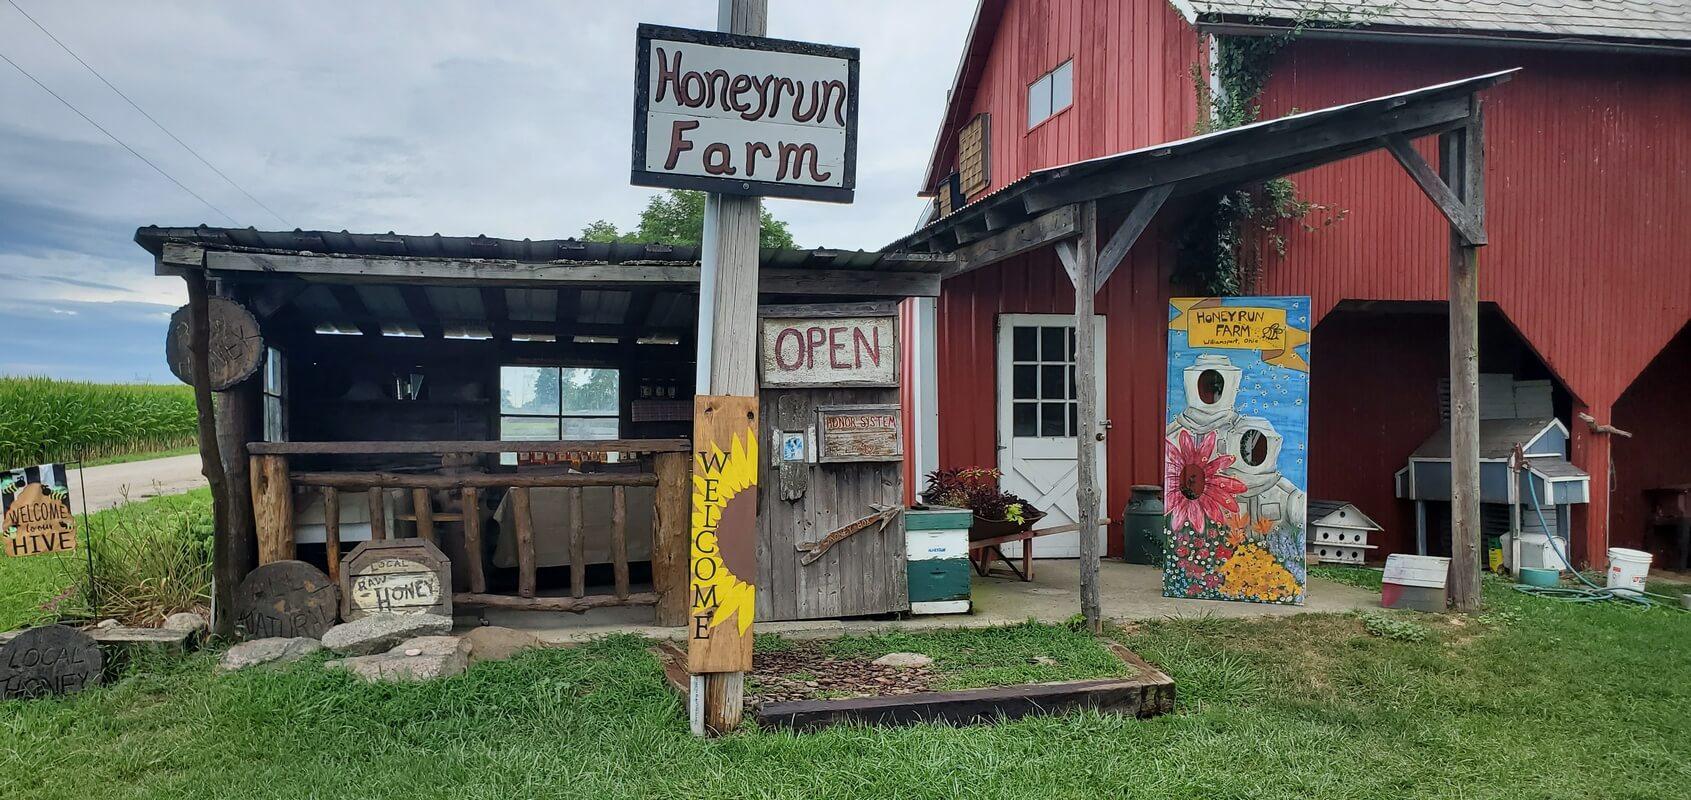 Honeyrun Farm Stand in Williamsport, Ohio